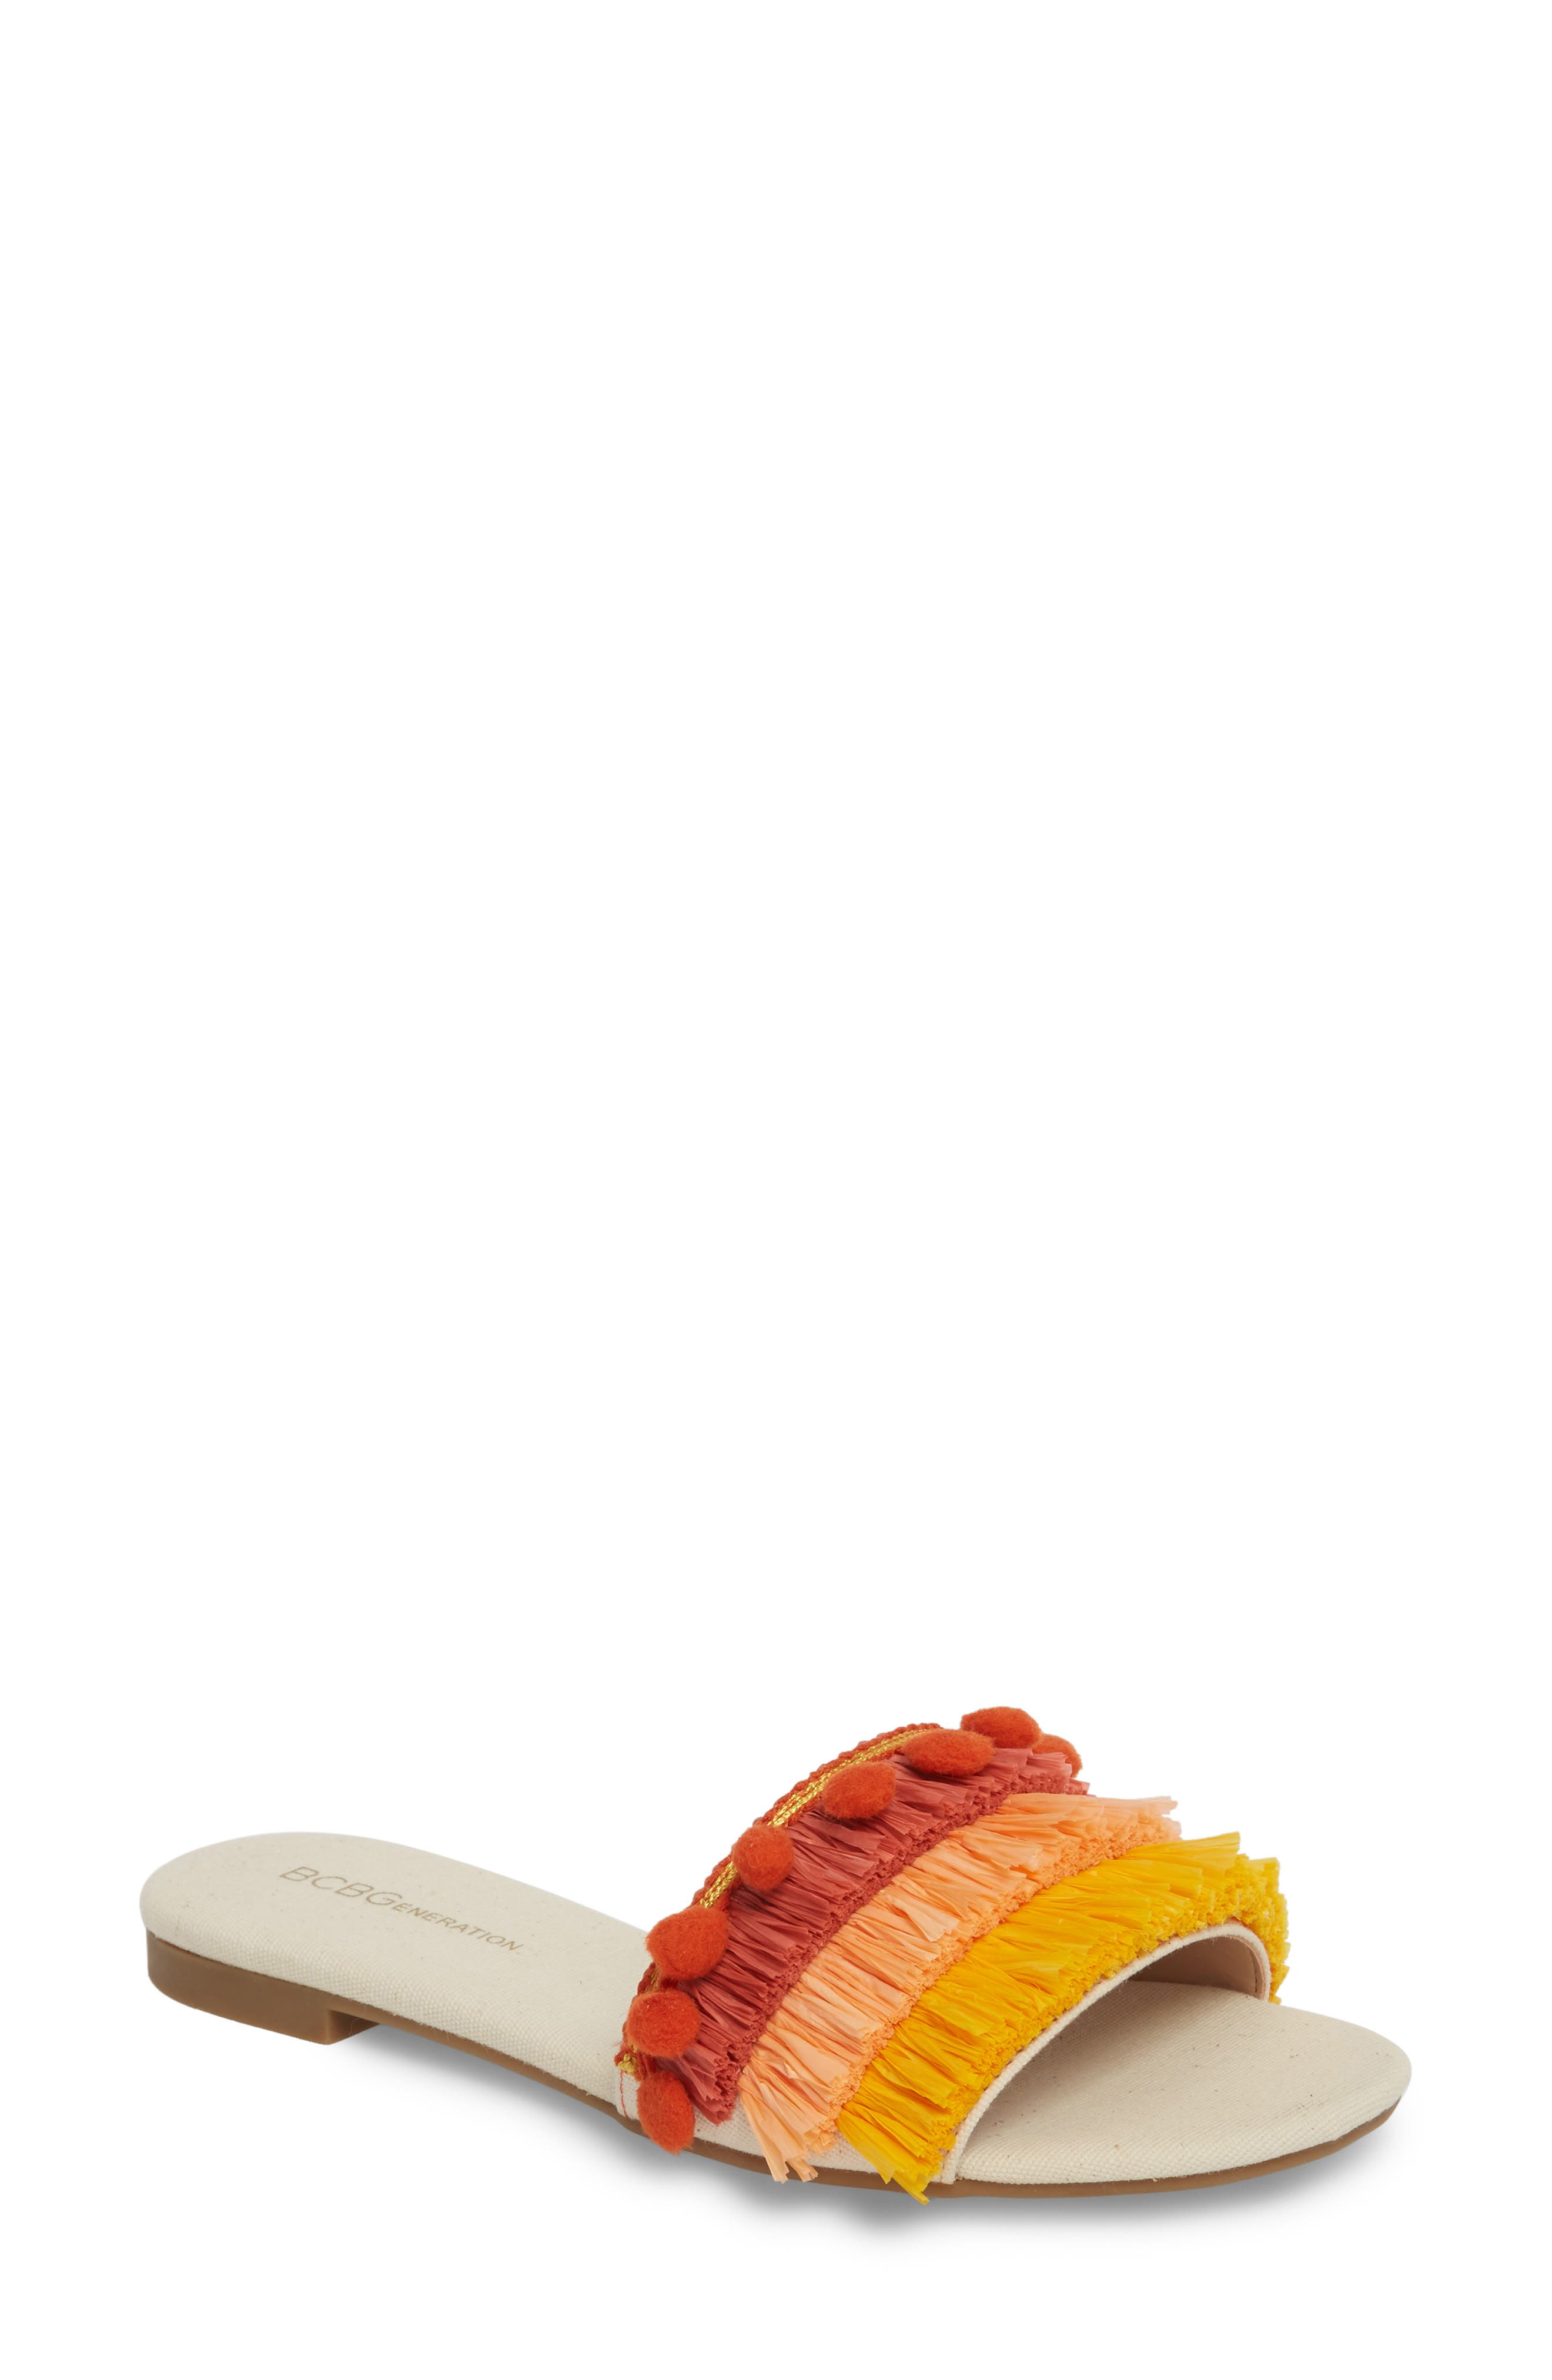 Genna Raffia Tier Slide Sandal,                             Main thumbnail 1, color,                             Marigold/ Rust